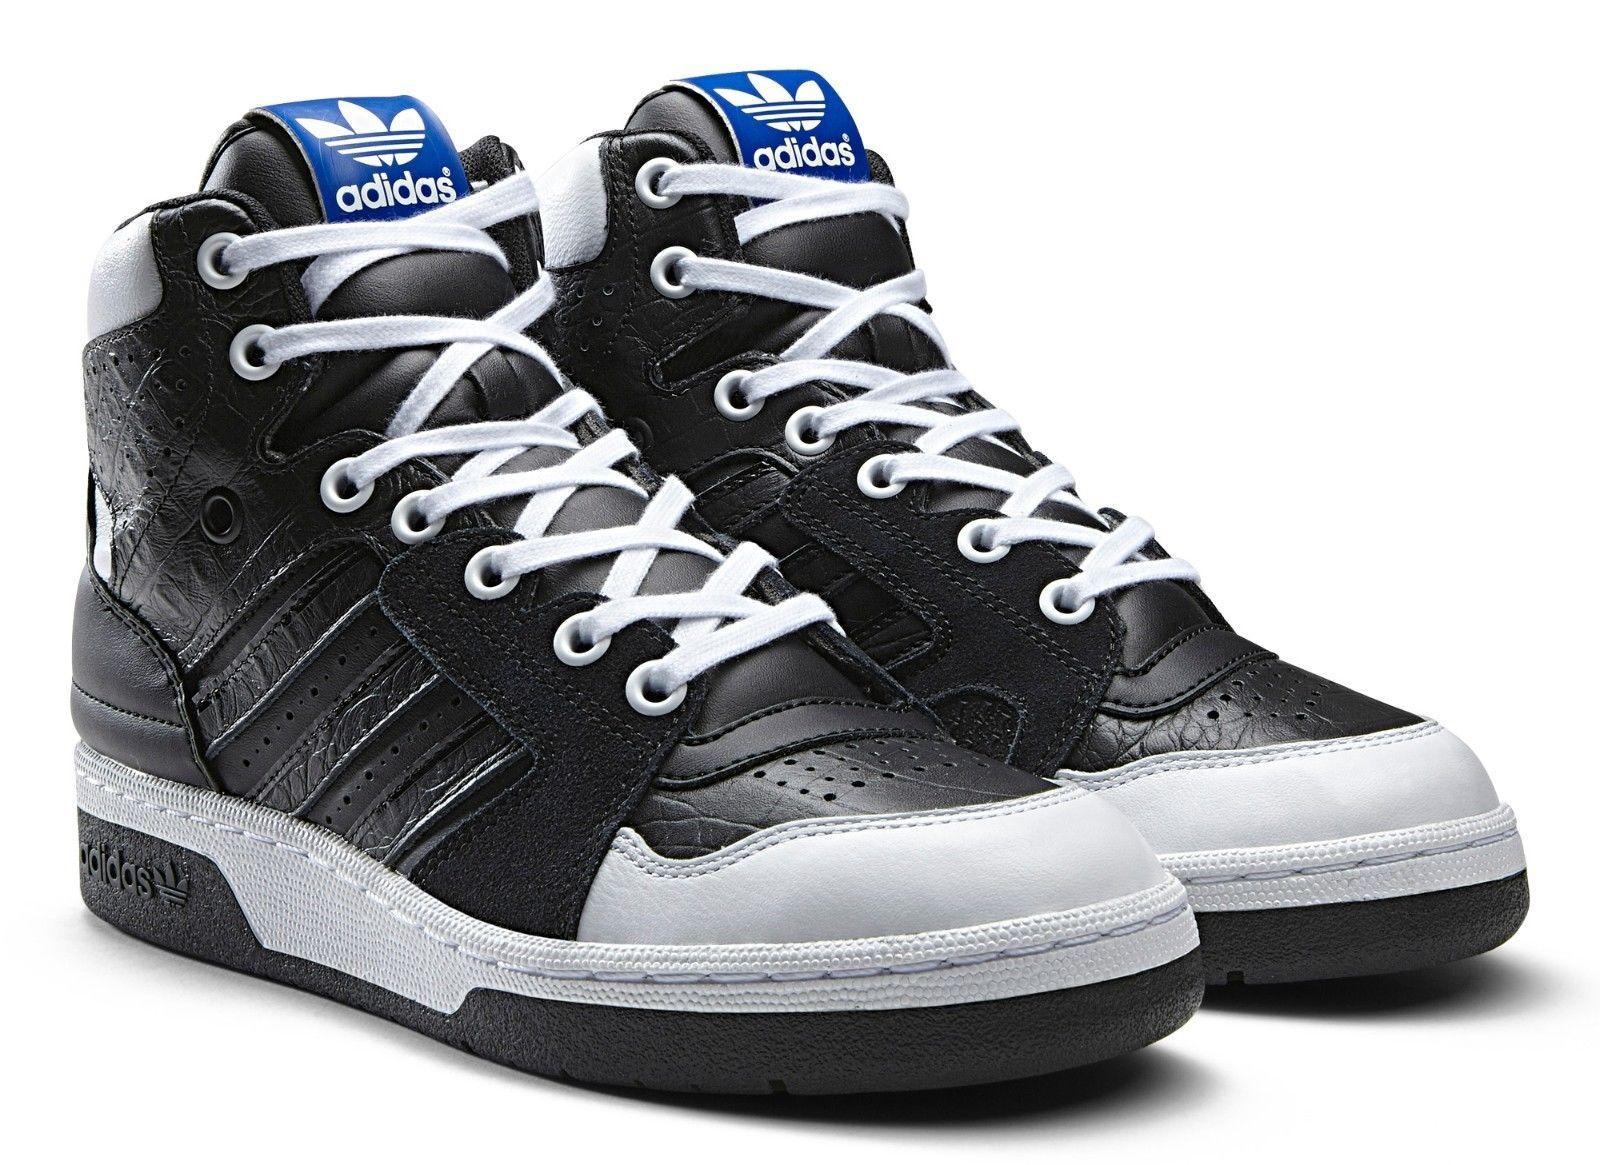 Adidas Originals Originals Originals X Rita Ora Women's Instinct Hi Top Fashion Sneakers Black fa1d1a